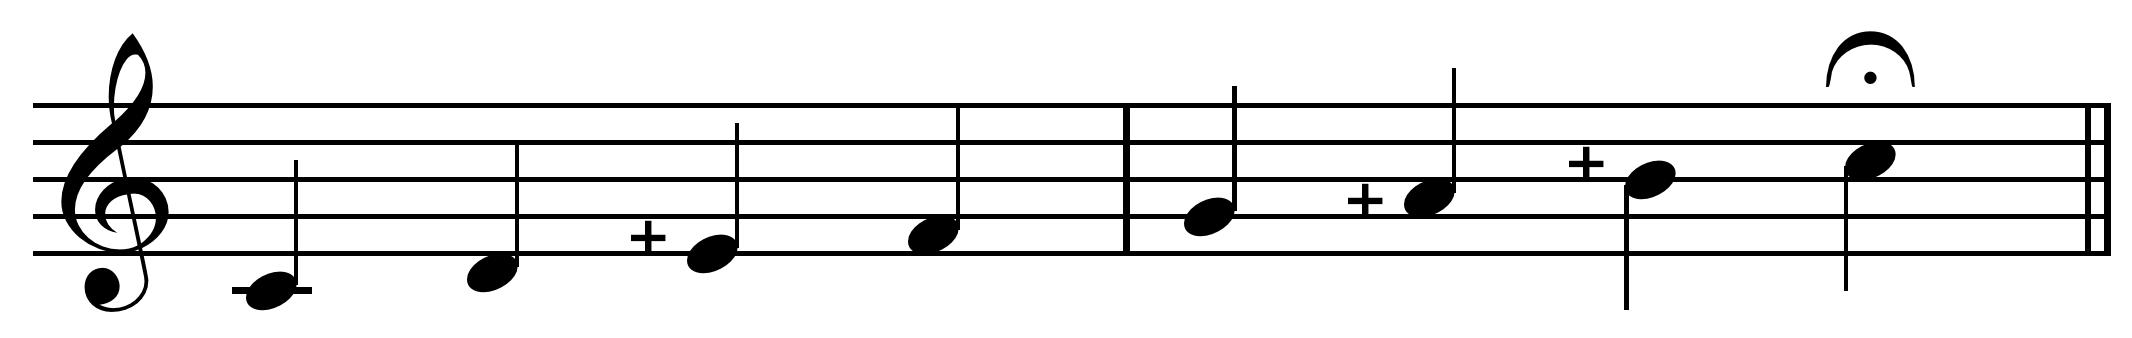 c scale2 1